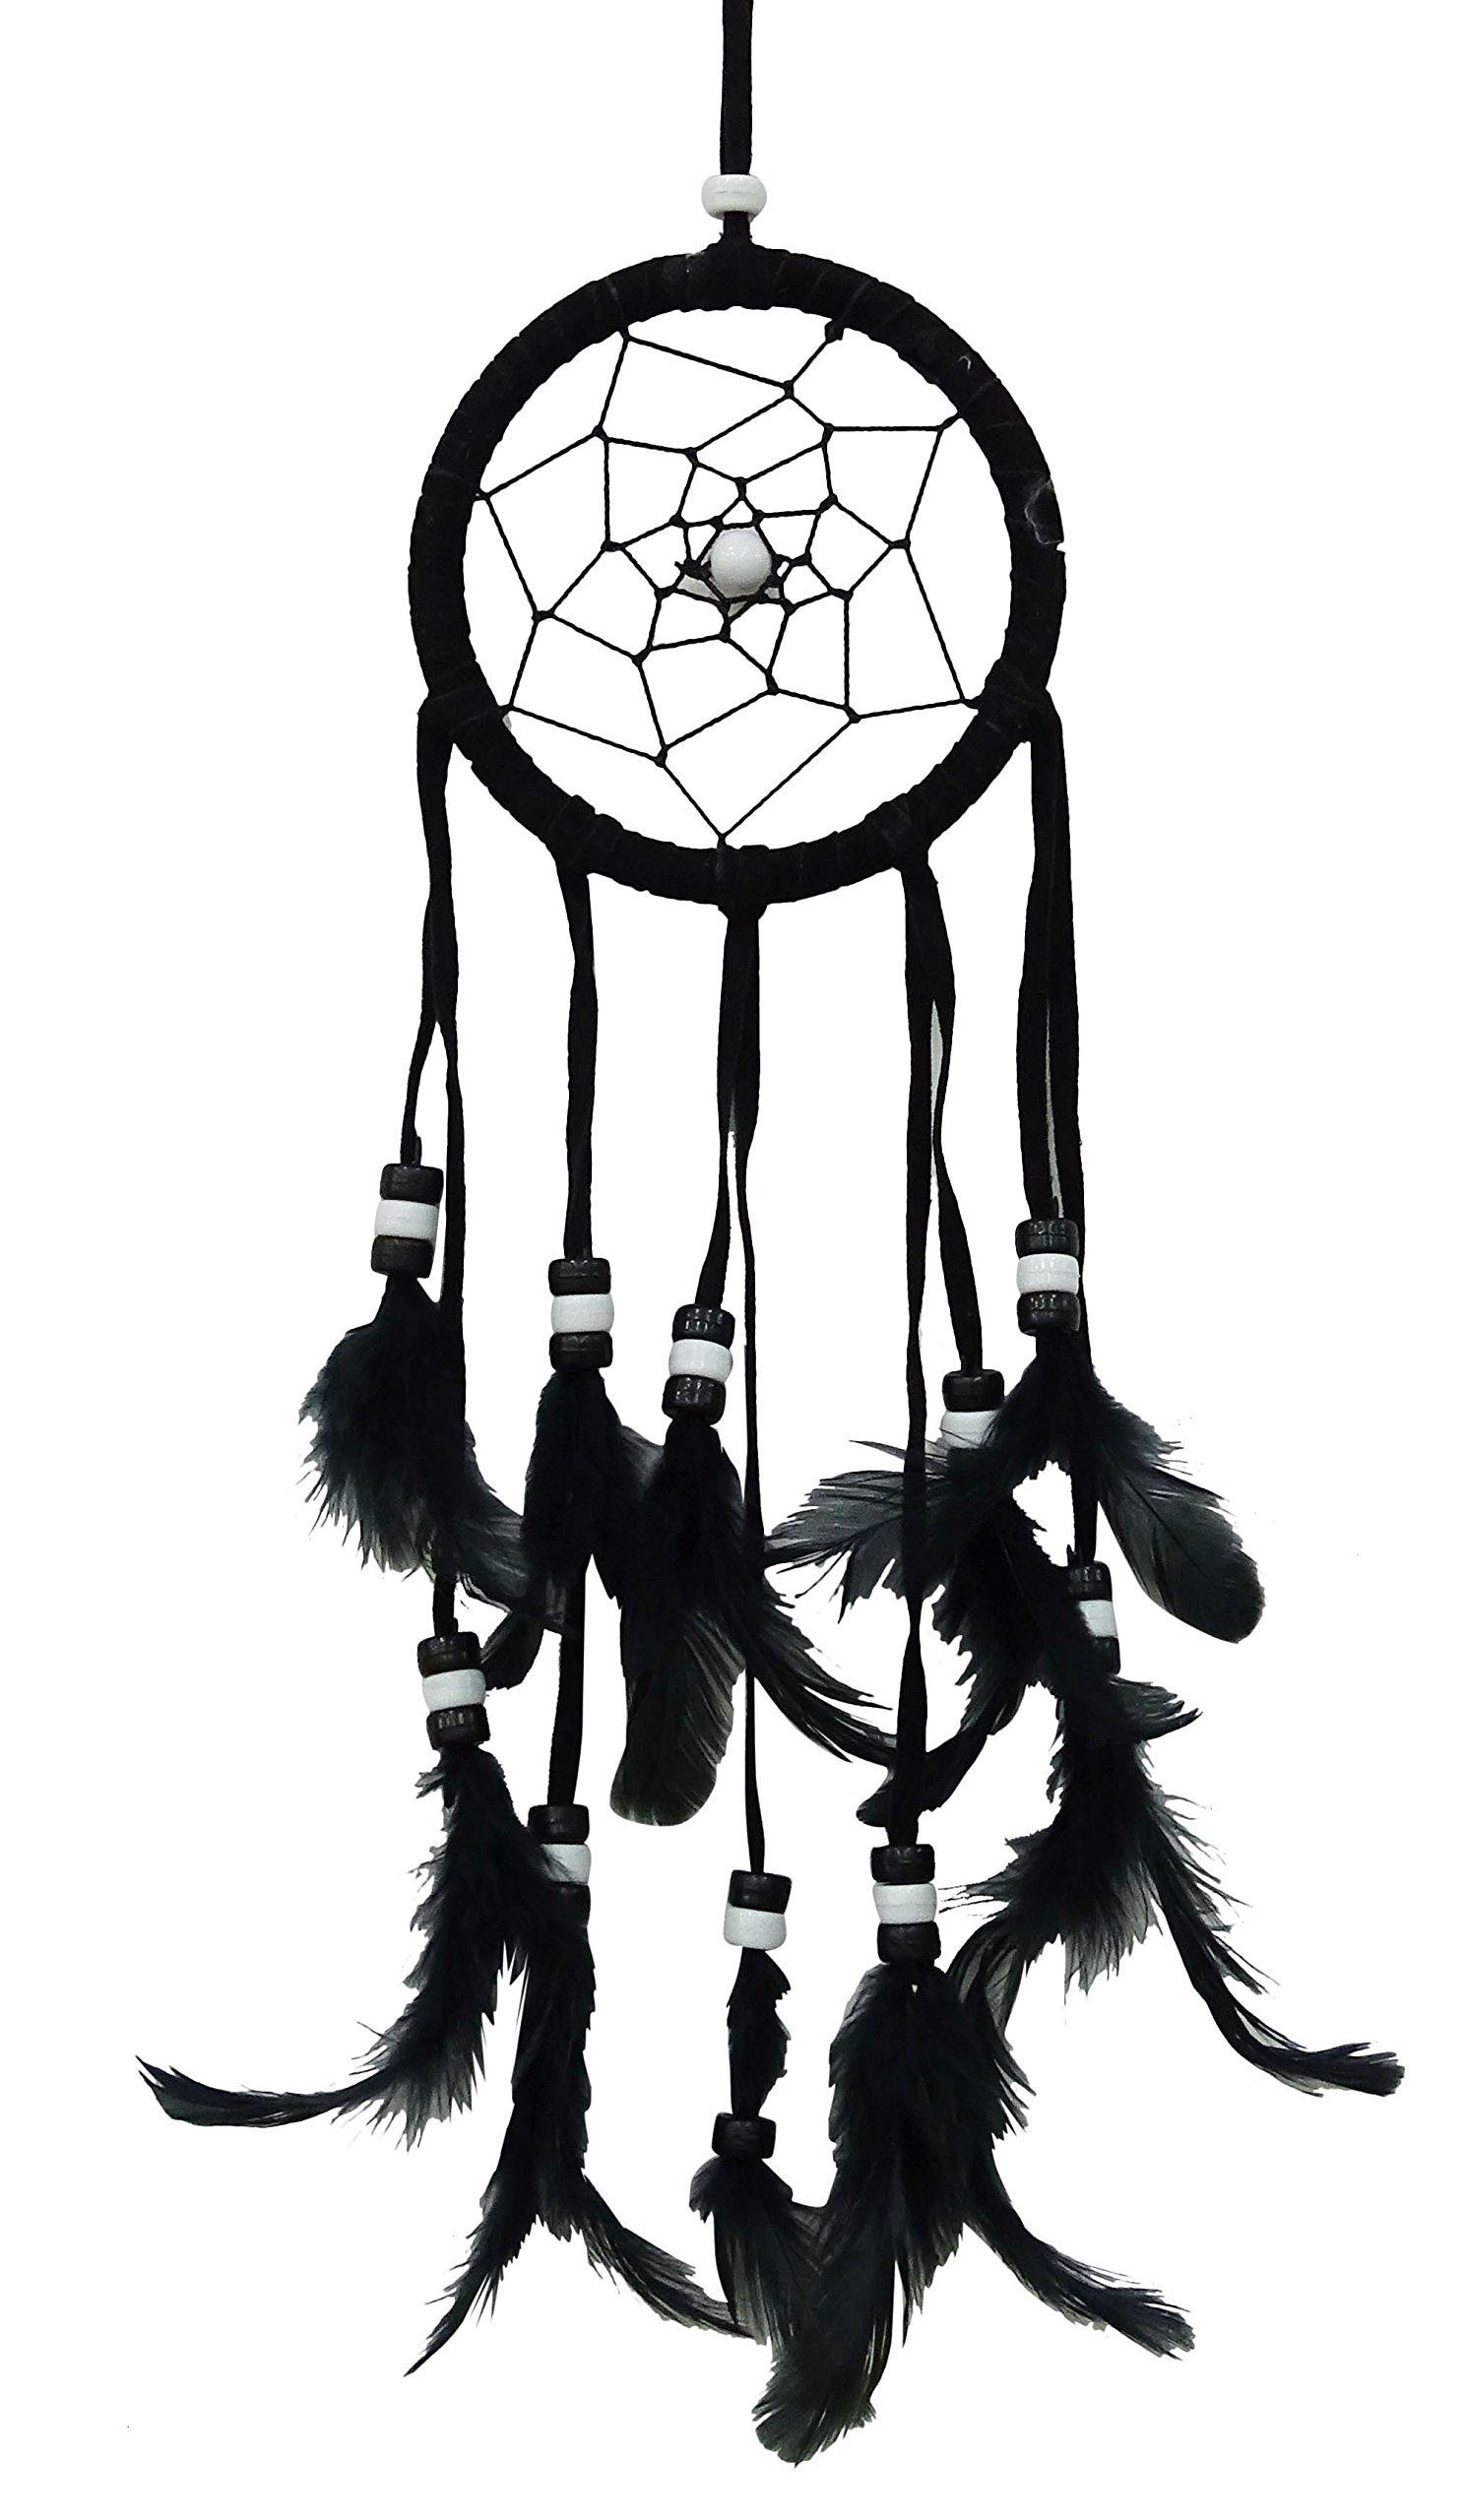 SuSvapnaah Black Faux Feather Dreamcatcher Small Boho Dream Catcher Wall Hanging Window Decor